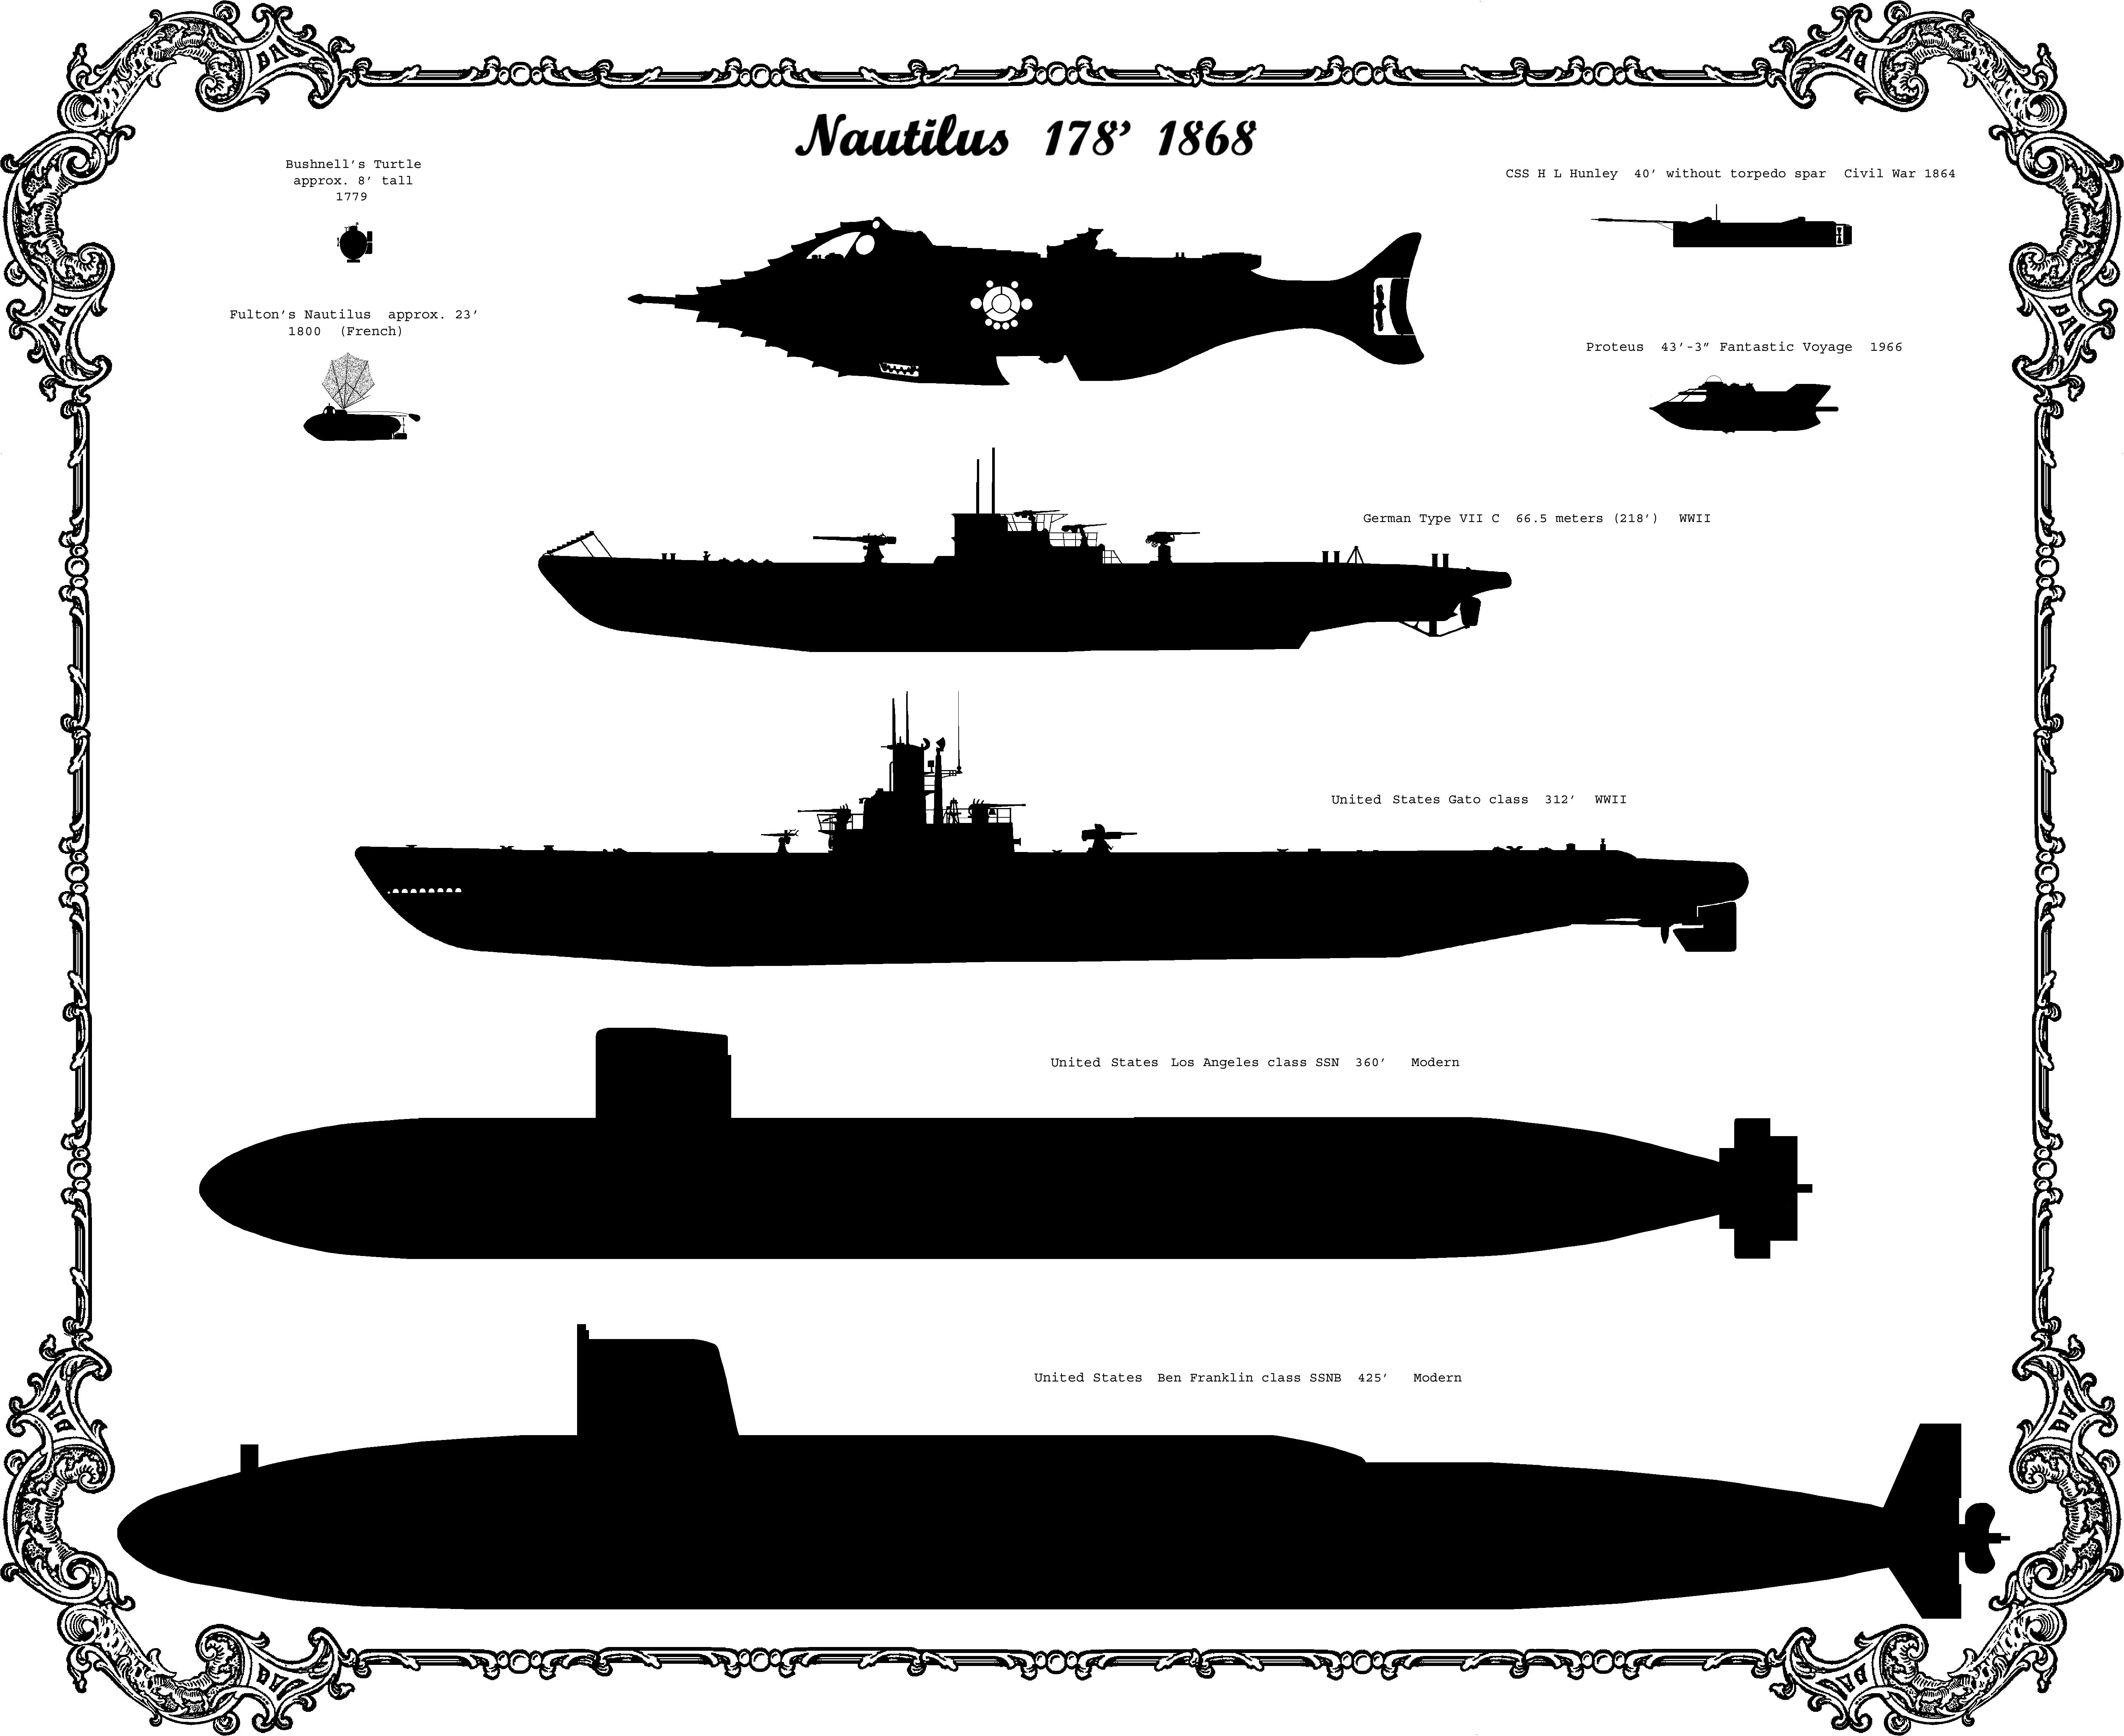 Disney Nautilus Submarine Wallpaper Wallpapersafari